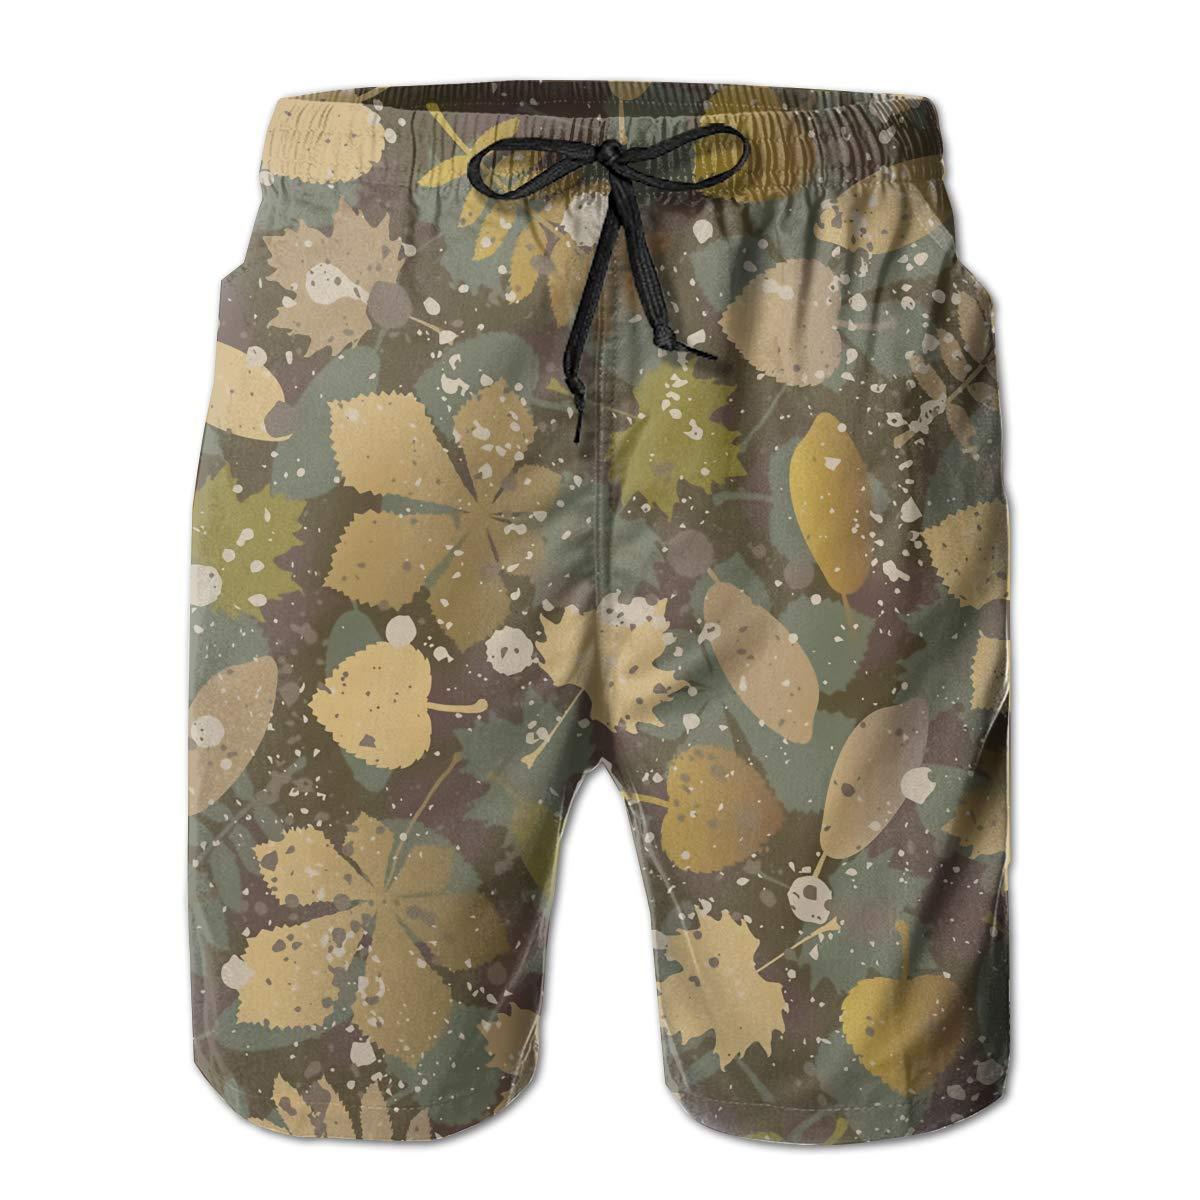 SARA NELL Mens Swim Trunks Camouflage Camo Fallen Leaves Surfing Beach Board Shorts Swimwear